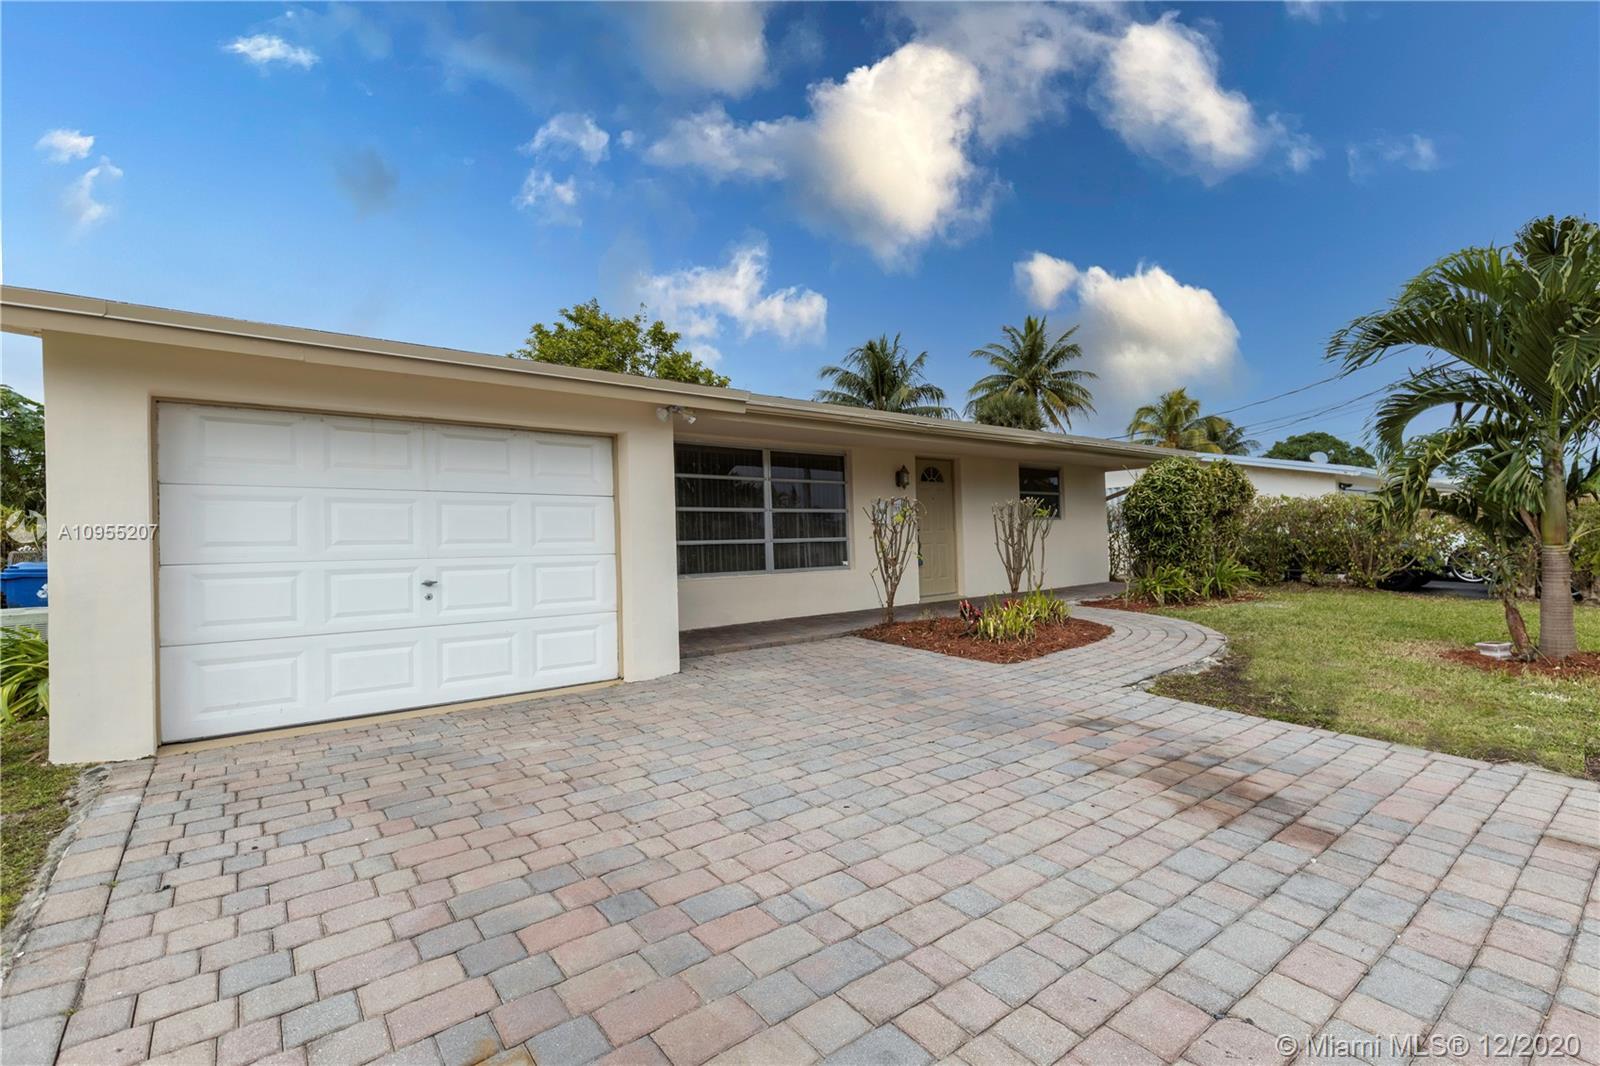 Sunrise Golf Village - 6621 NW 25th Ct, Sunrise, FL 33313